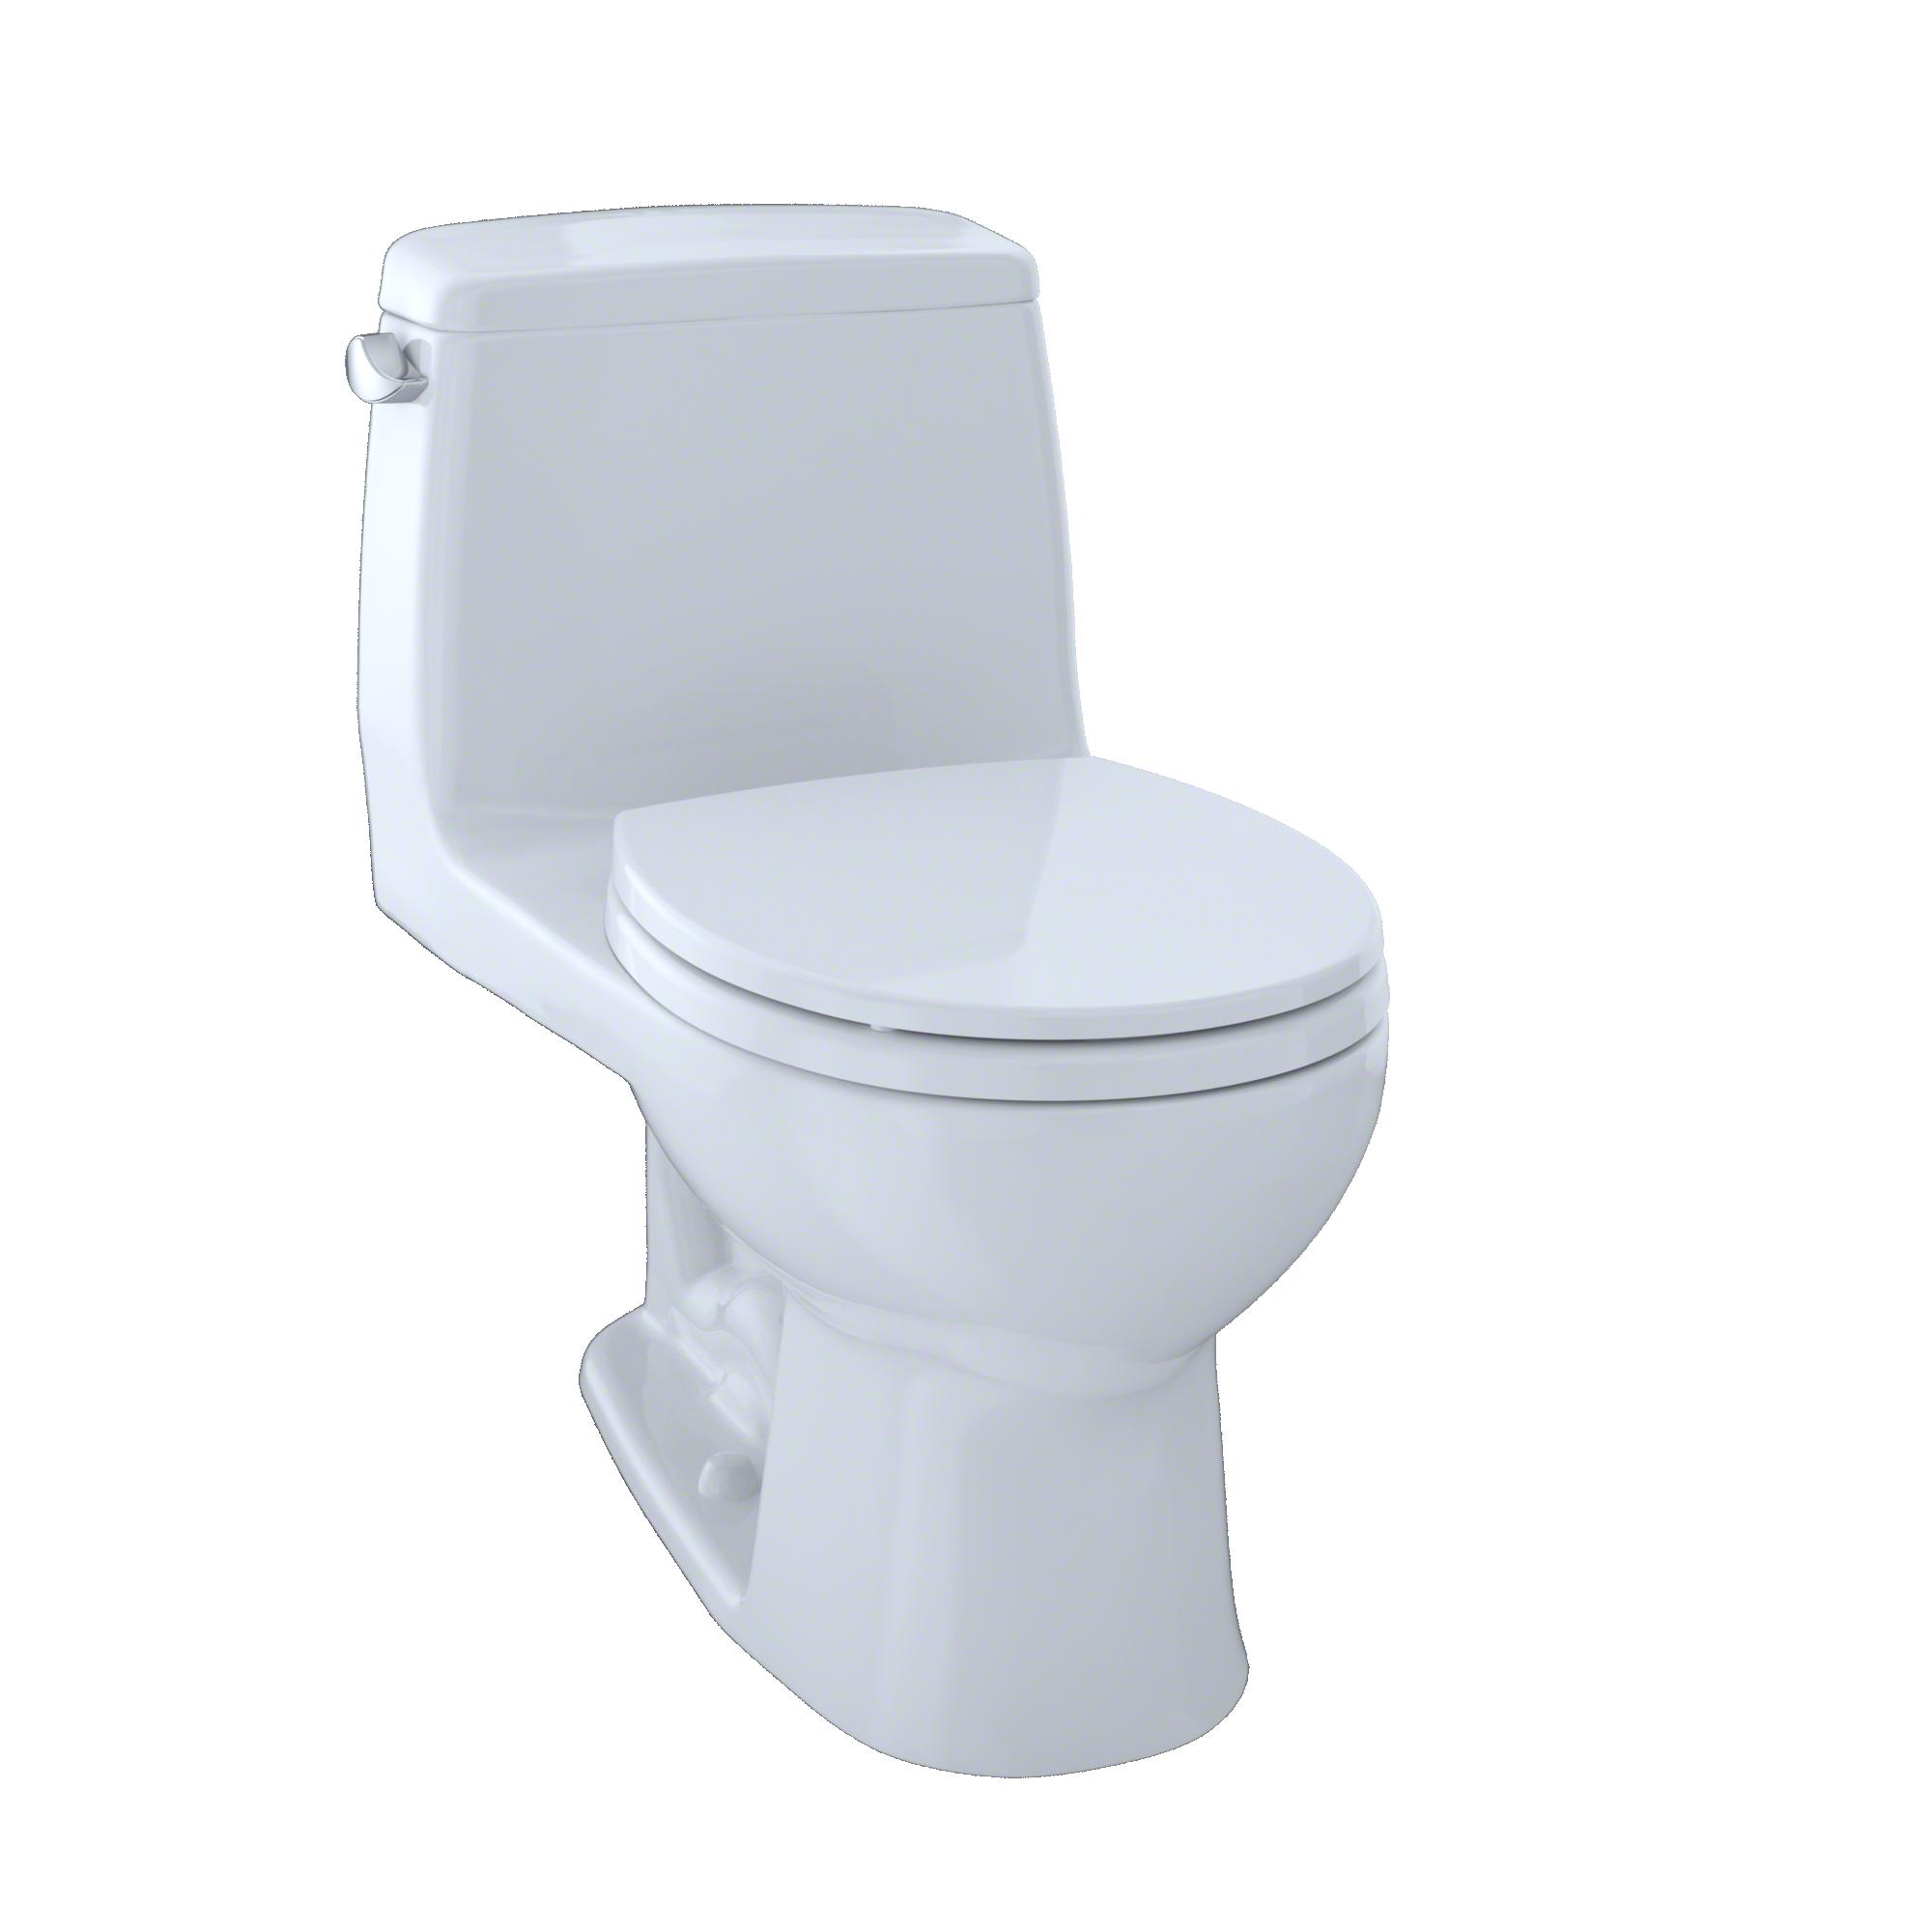 TOTO® Ultimate® One-Piece Round Bowl 1.6 GPF Toilet, Cotton White - MS853113#01